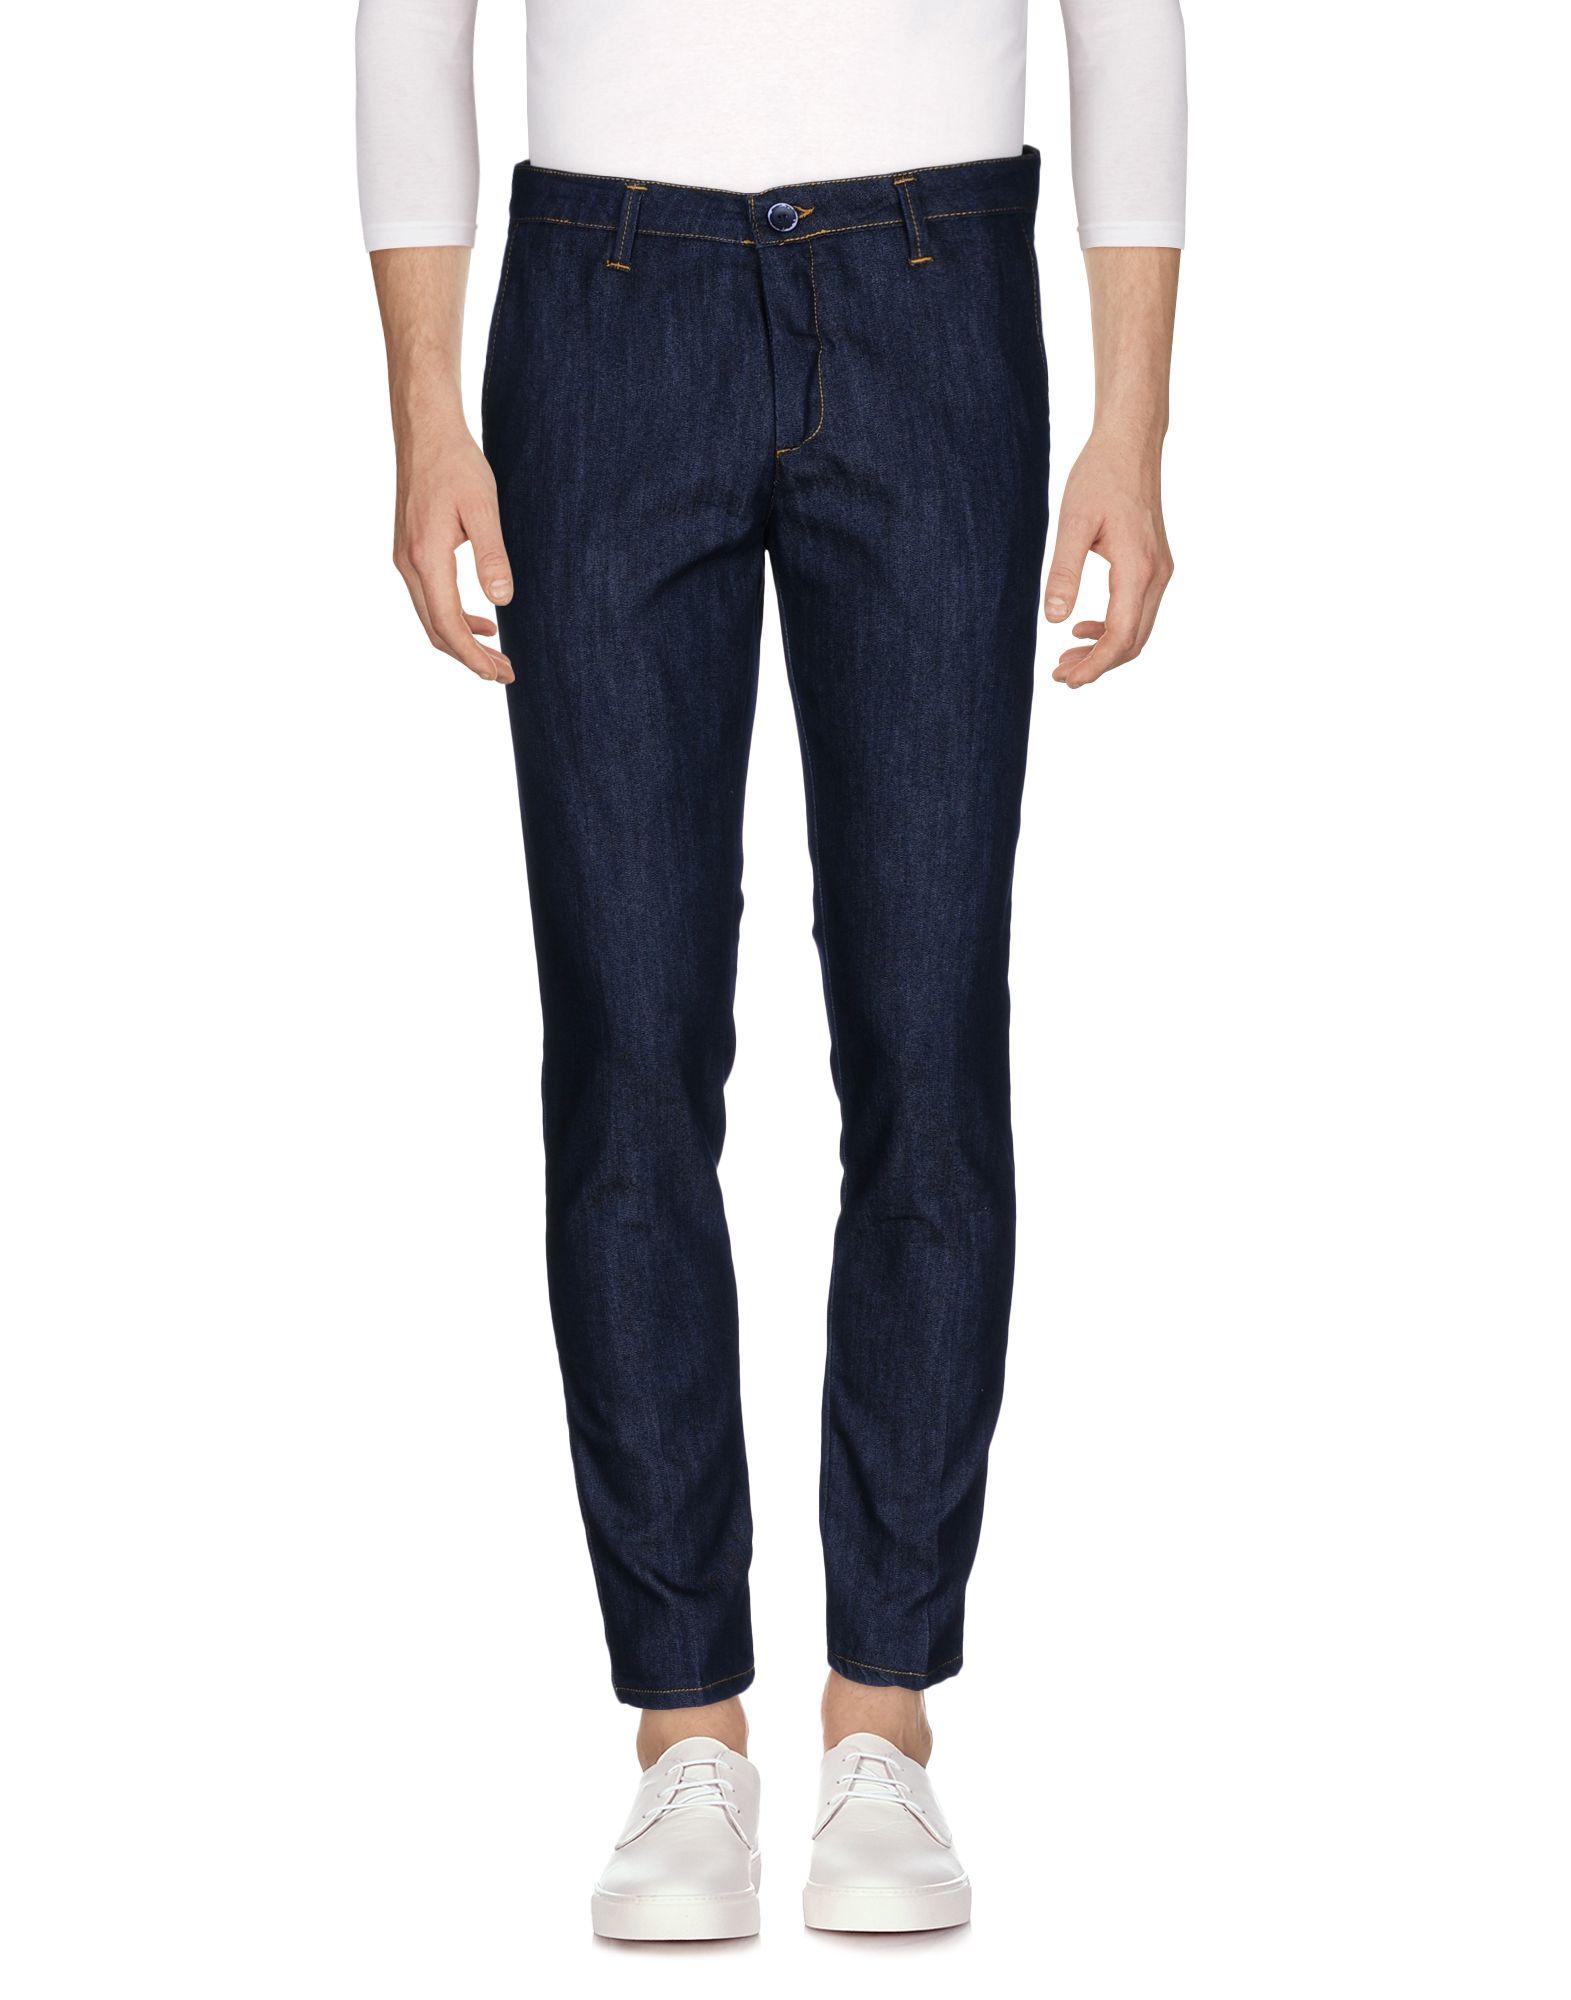 Pantaloni Jeans Besilent uomo - - - 42633688GK a3f